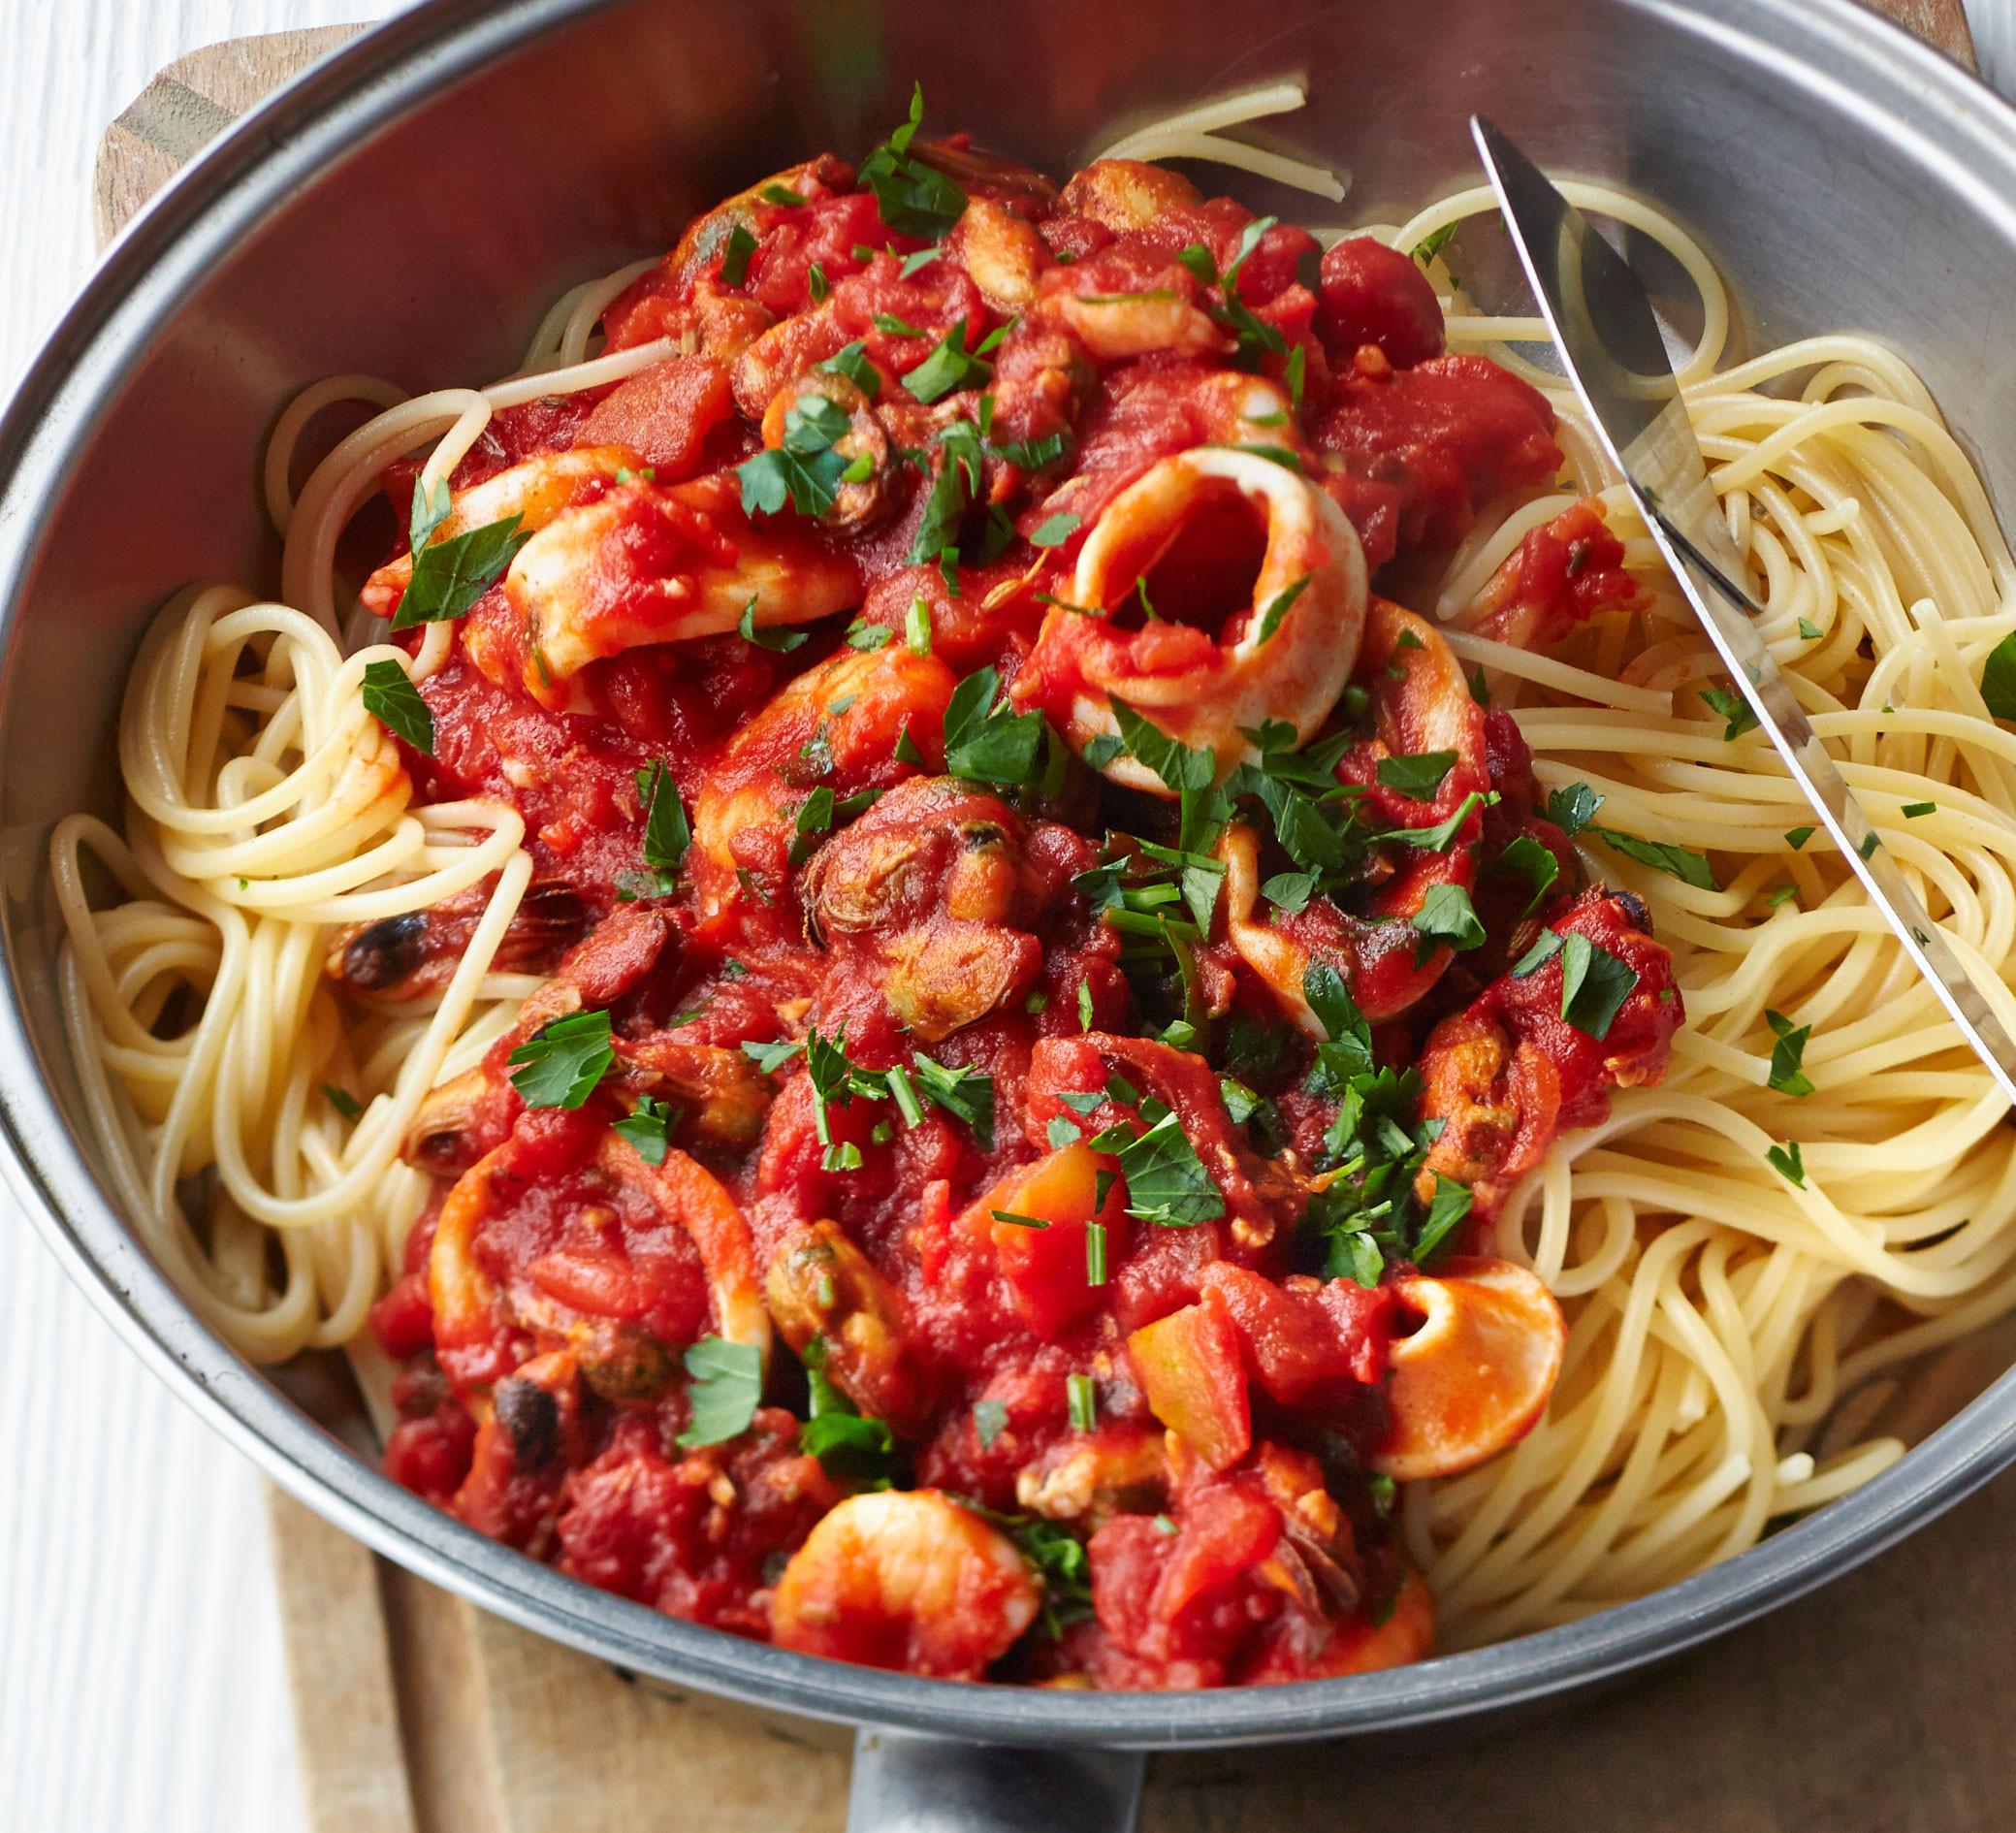 Healthy Spaghetti Sauce Recipe  Spaghetti with smoky tomato & seafood sauce recipe